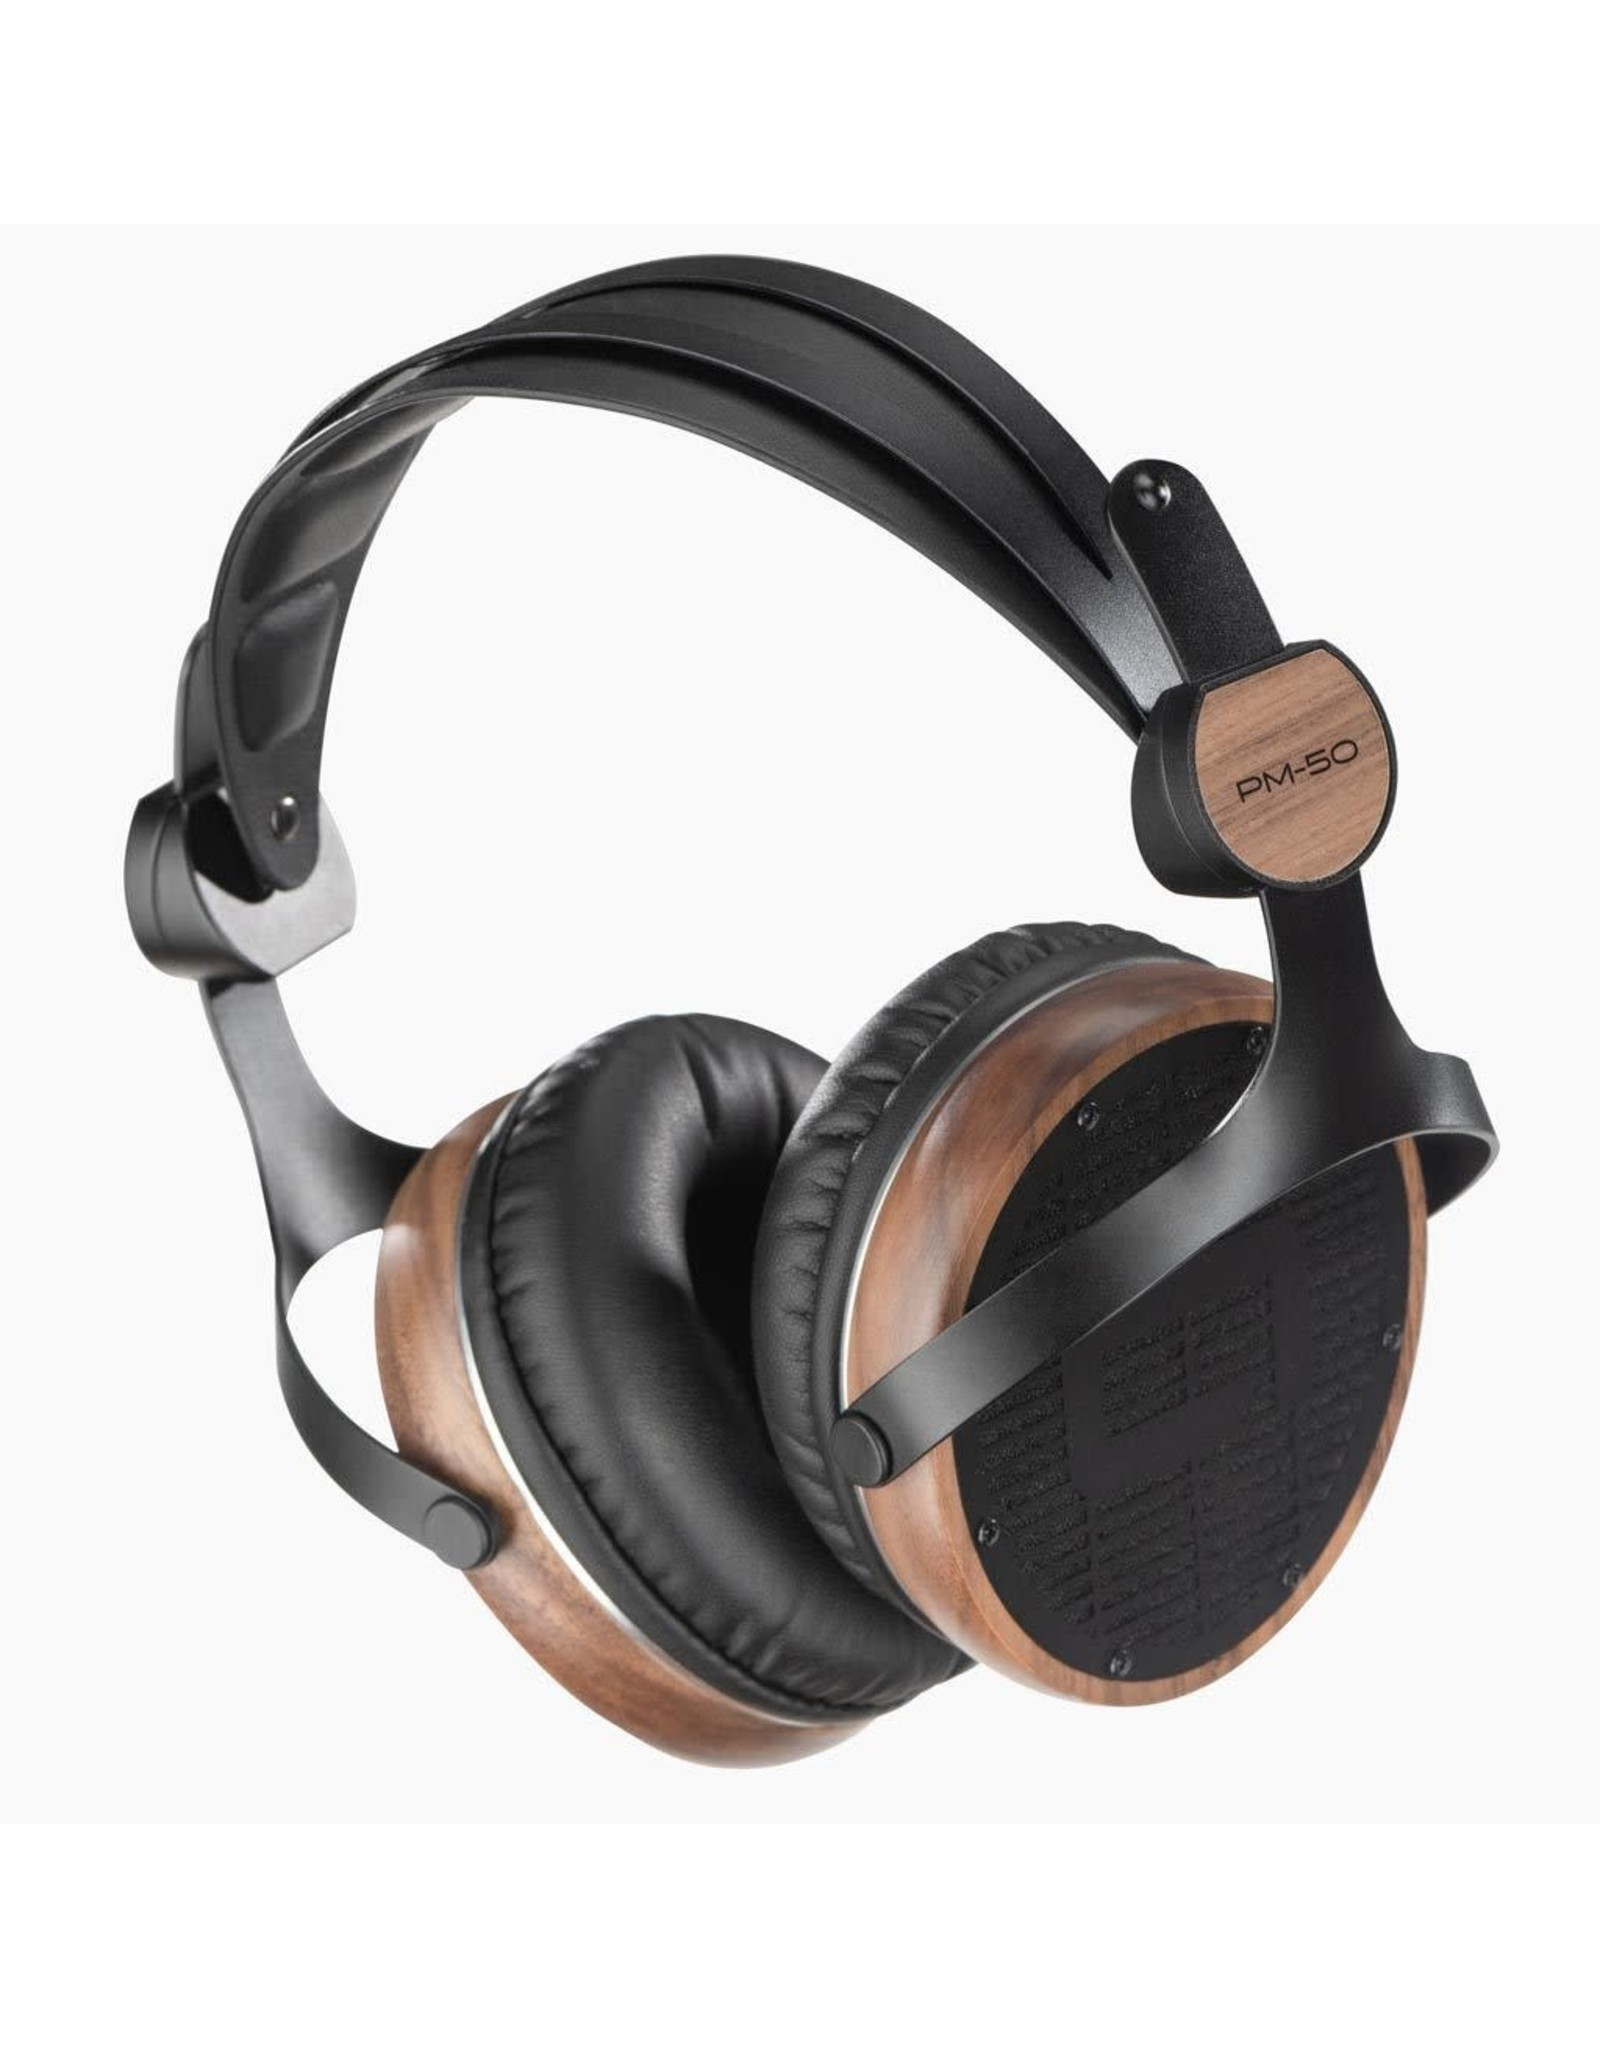 Andover Audio Andover Audio PM-50 Planar Headphones